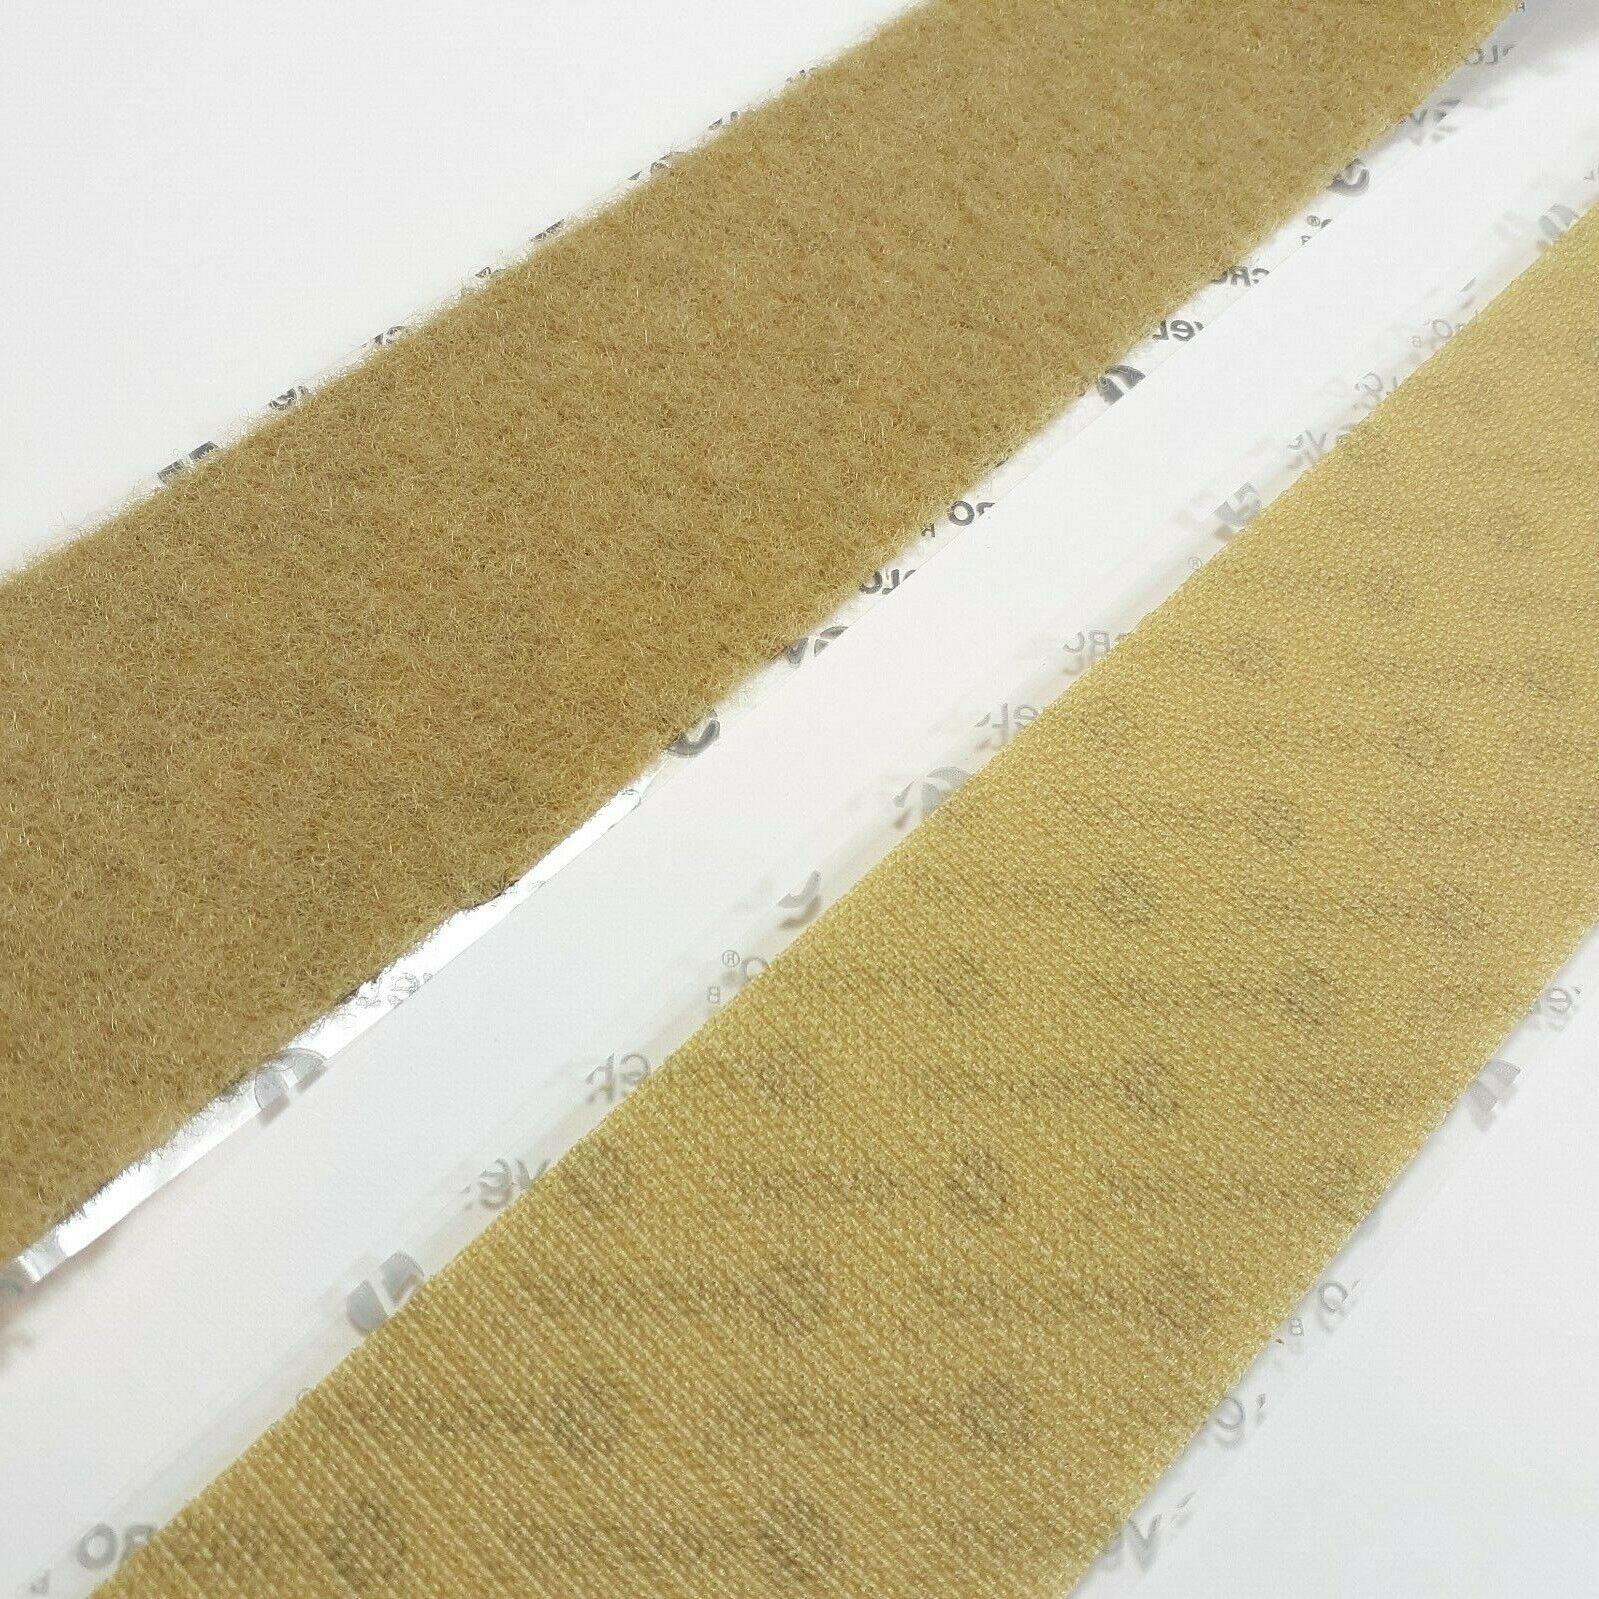 "1"" Wide Beige VELCRO® Brand High Tack Self Adhesive Tape St"